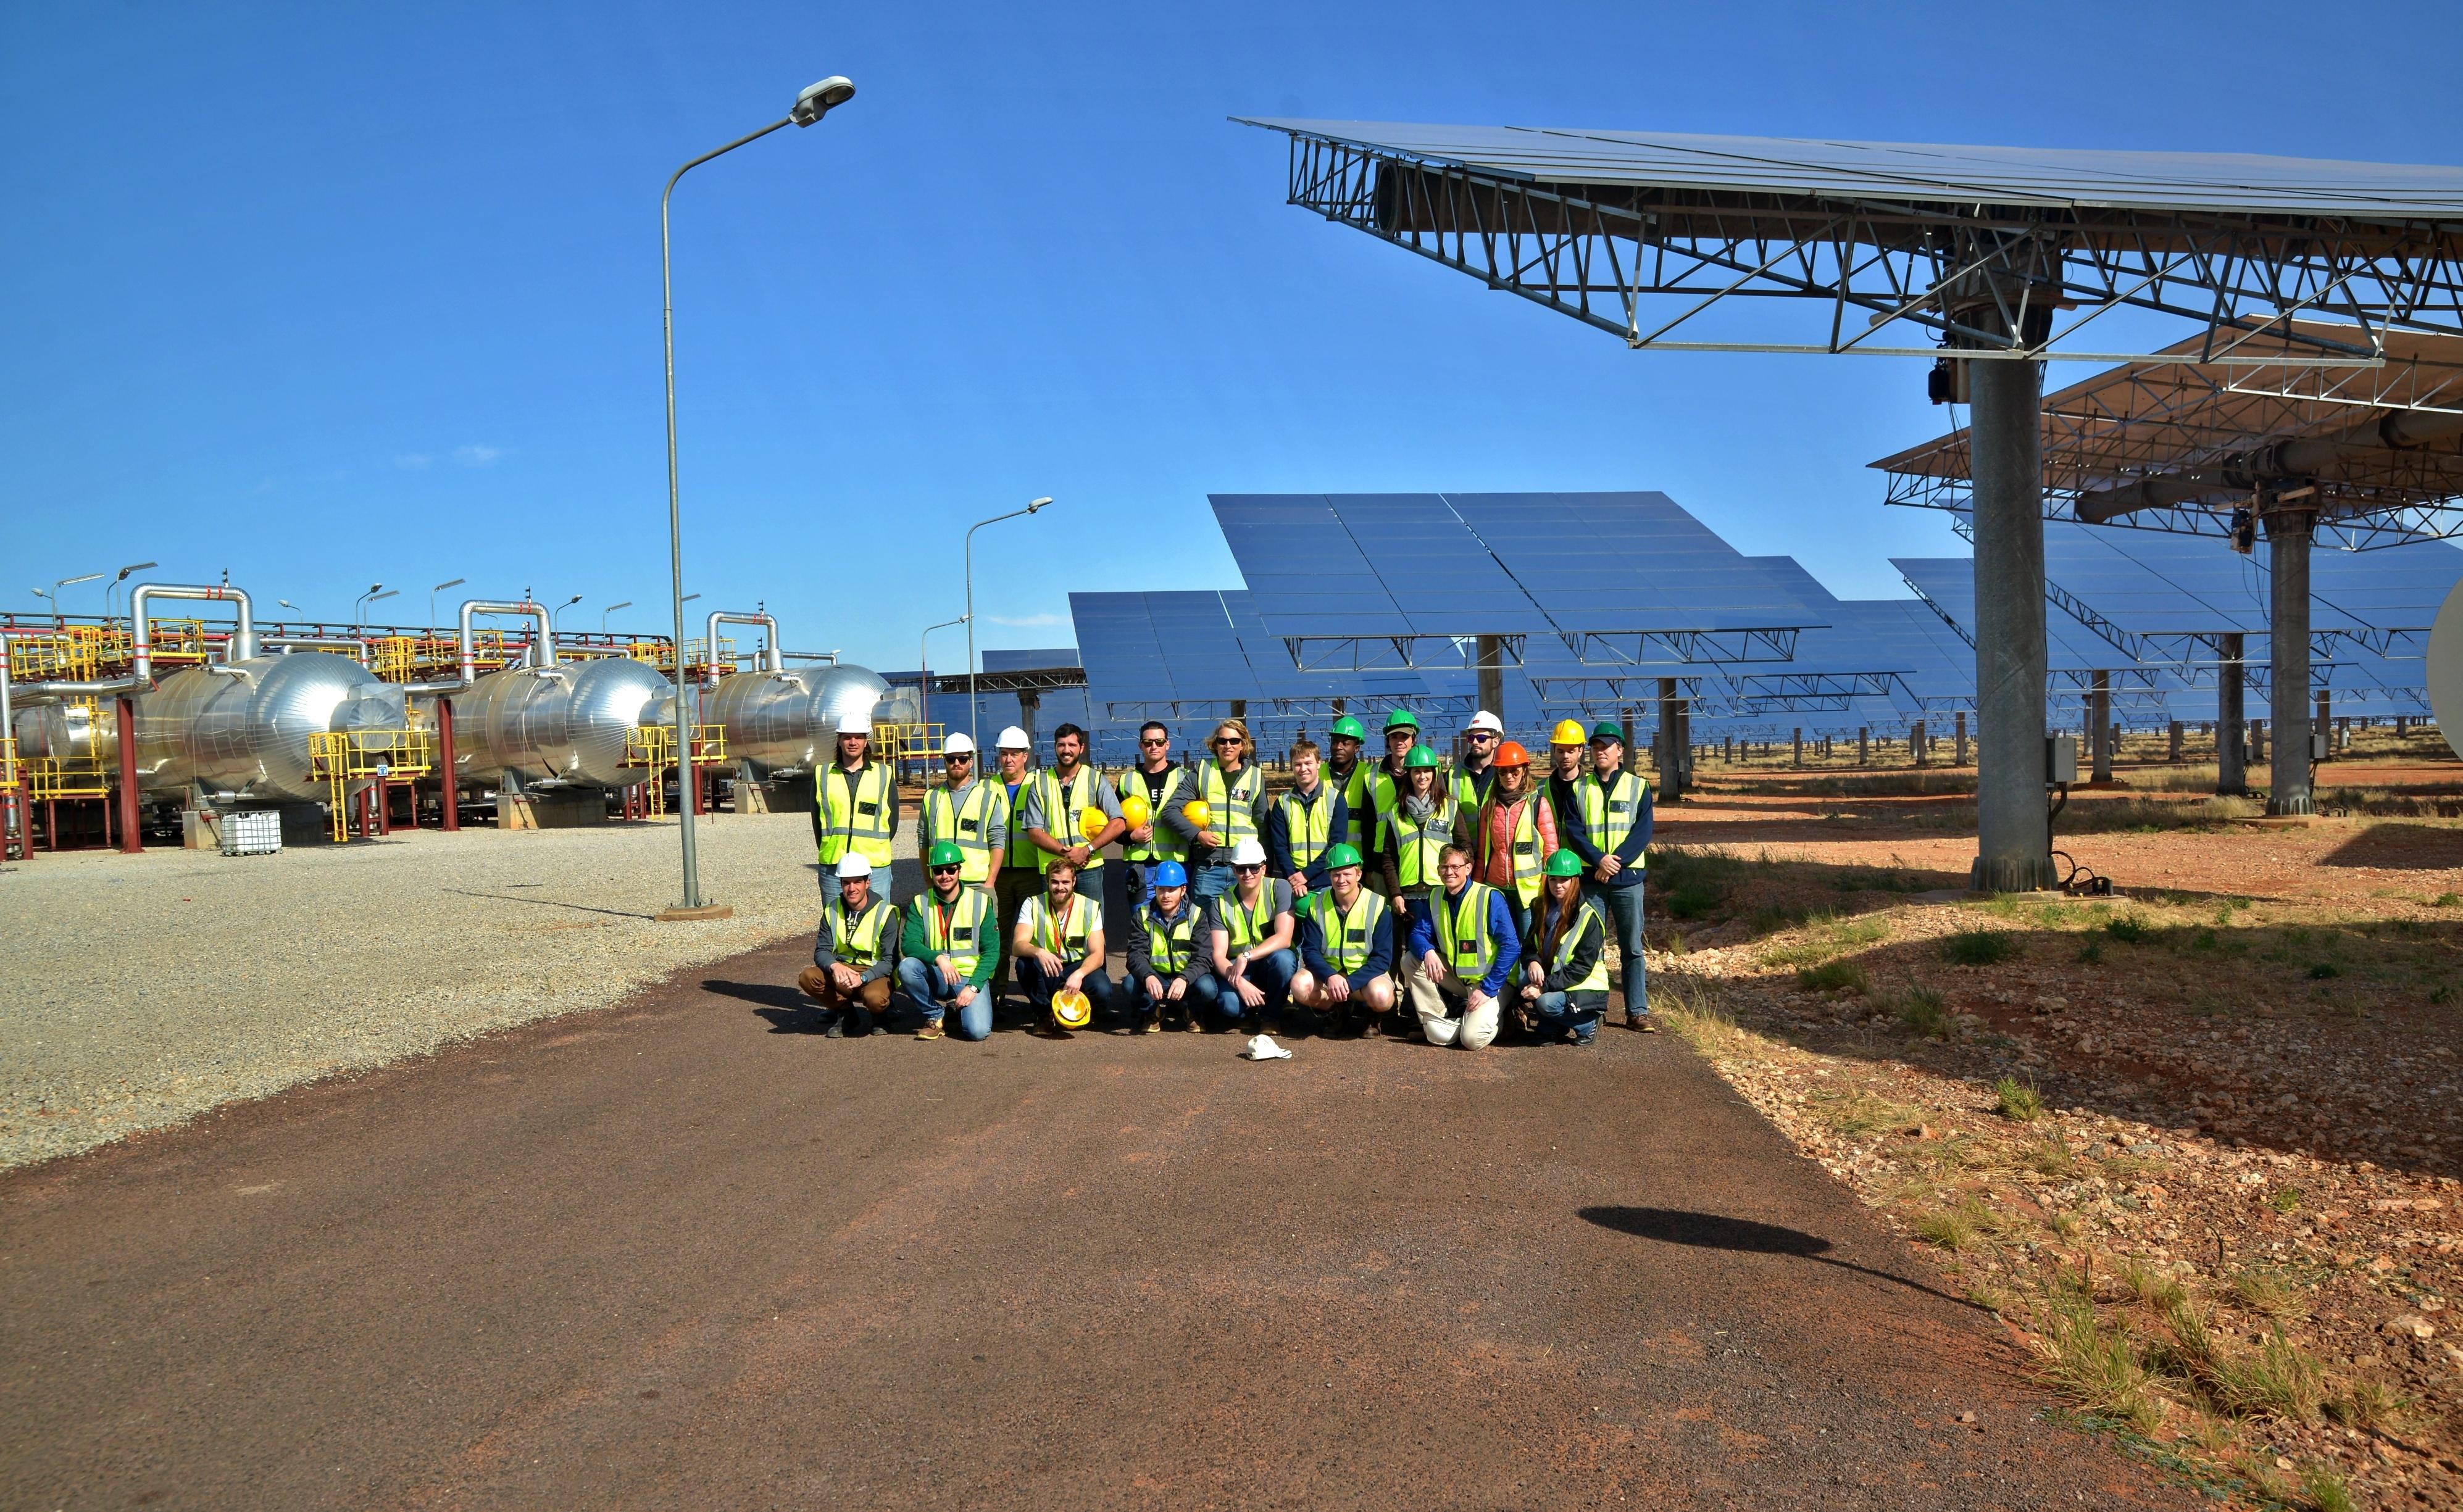 The technical tour team at the Khi Solar Plant. Photo courtesy of Frank Duvenhage